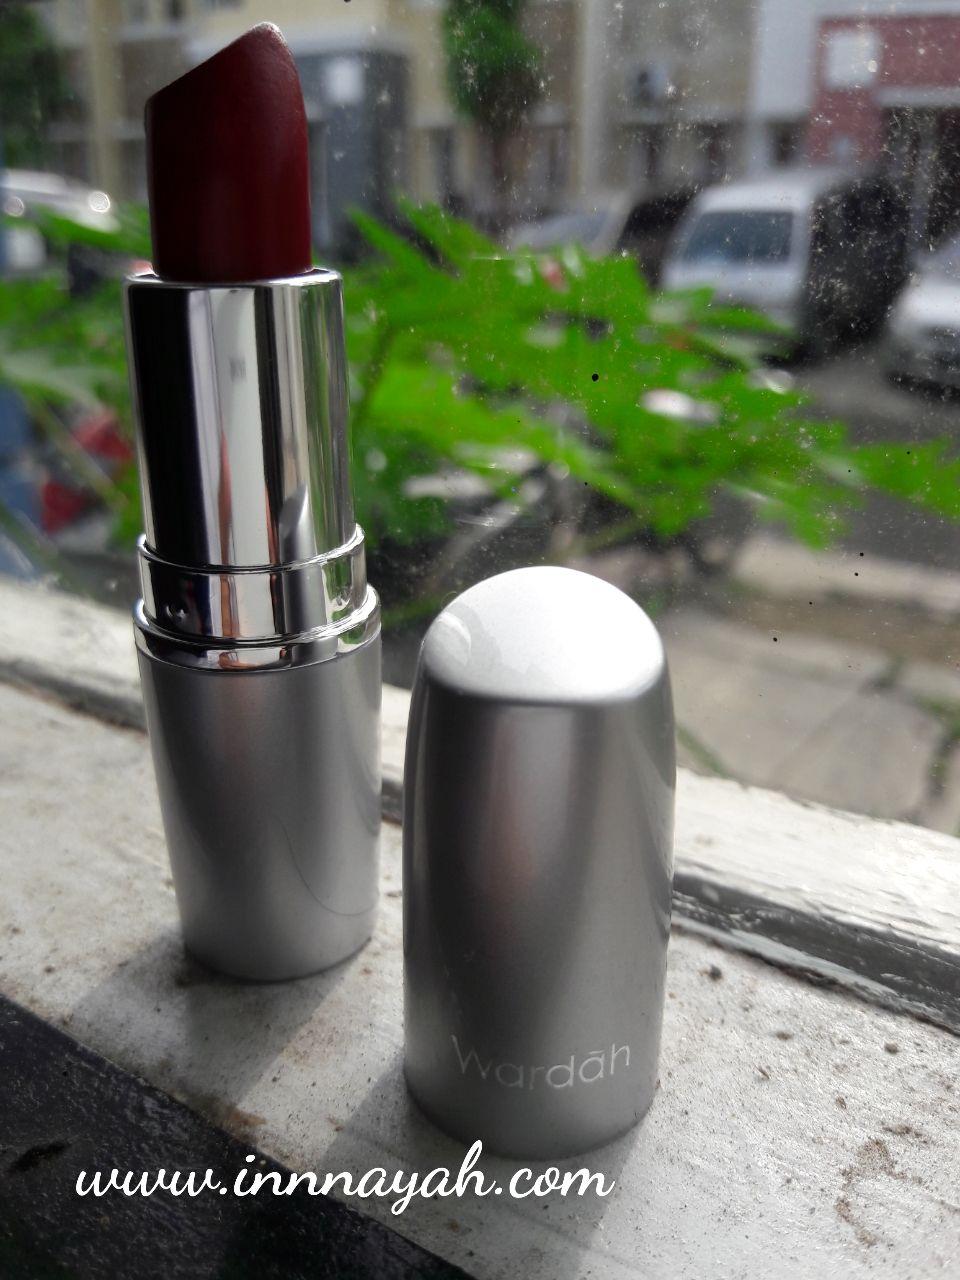 Review Wardah Matte Lipstick No 10 Maroon Blogpost Pinterest Make Up Kit Special Edition Packaging